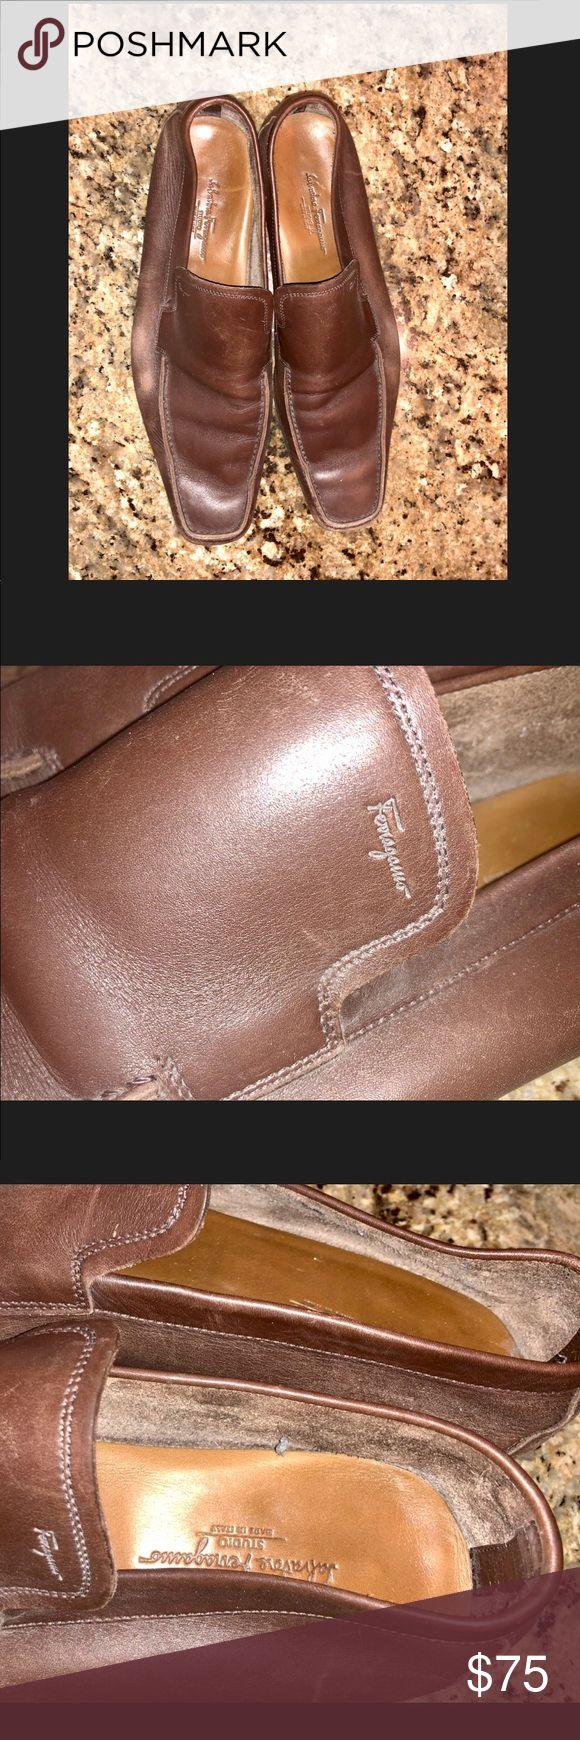 Men's Ferragamo Brown Loafers Men's US Size 10 Men's Salvatore Ferragamo Brown Loafers Men's US Size 10 Condition: Pre-owned / Used Salvatore Ferragamo Shoes Loafers & Slip-Ons